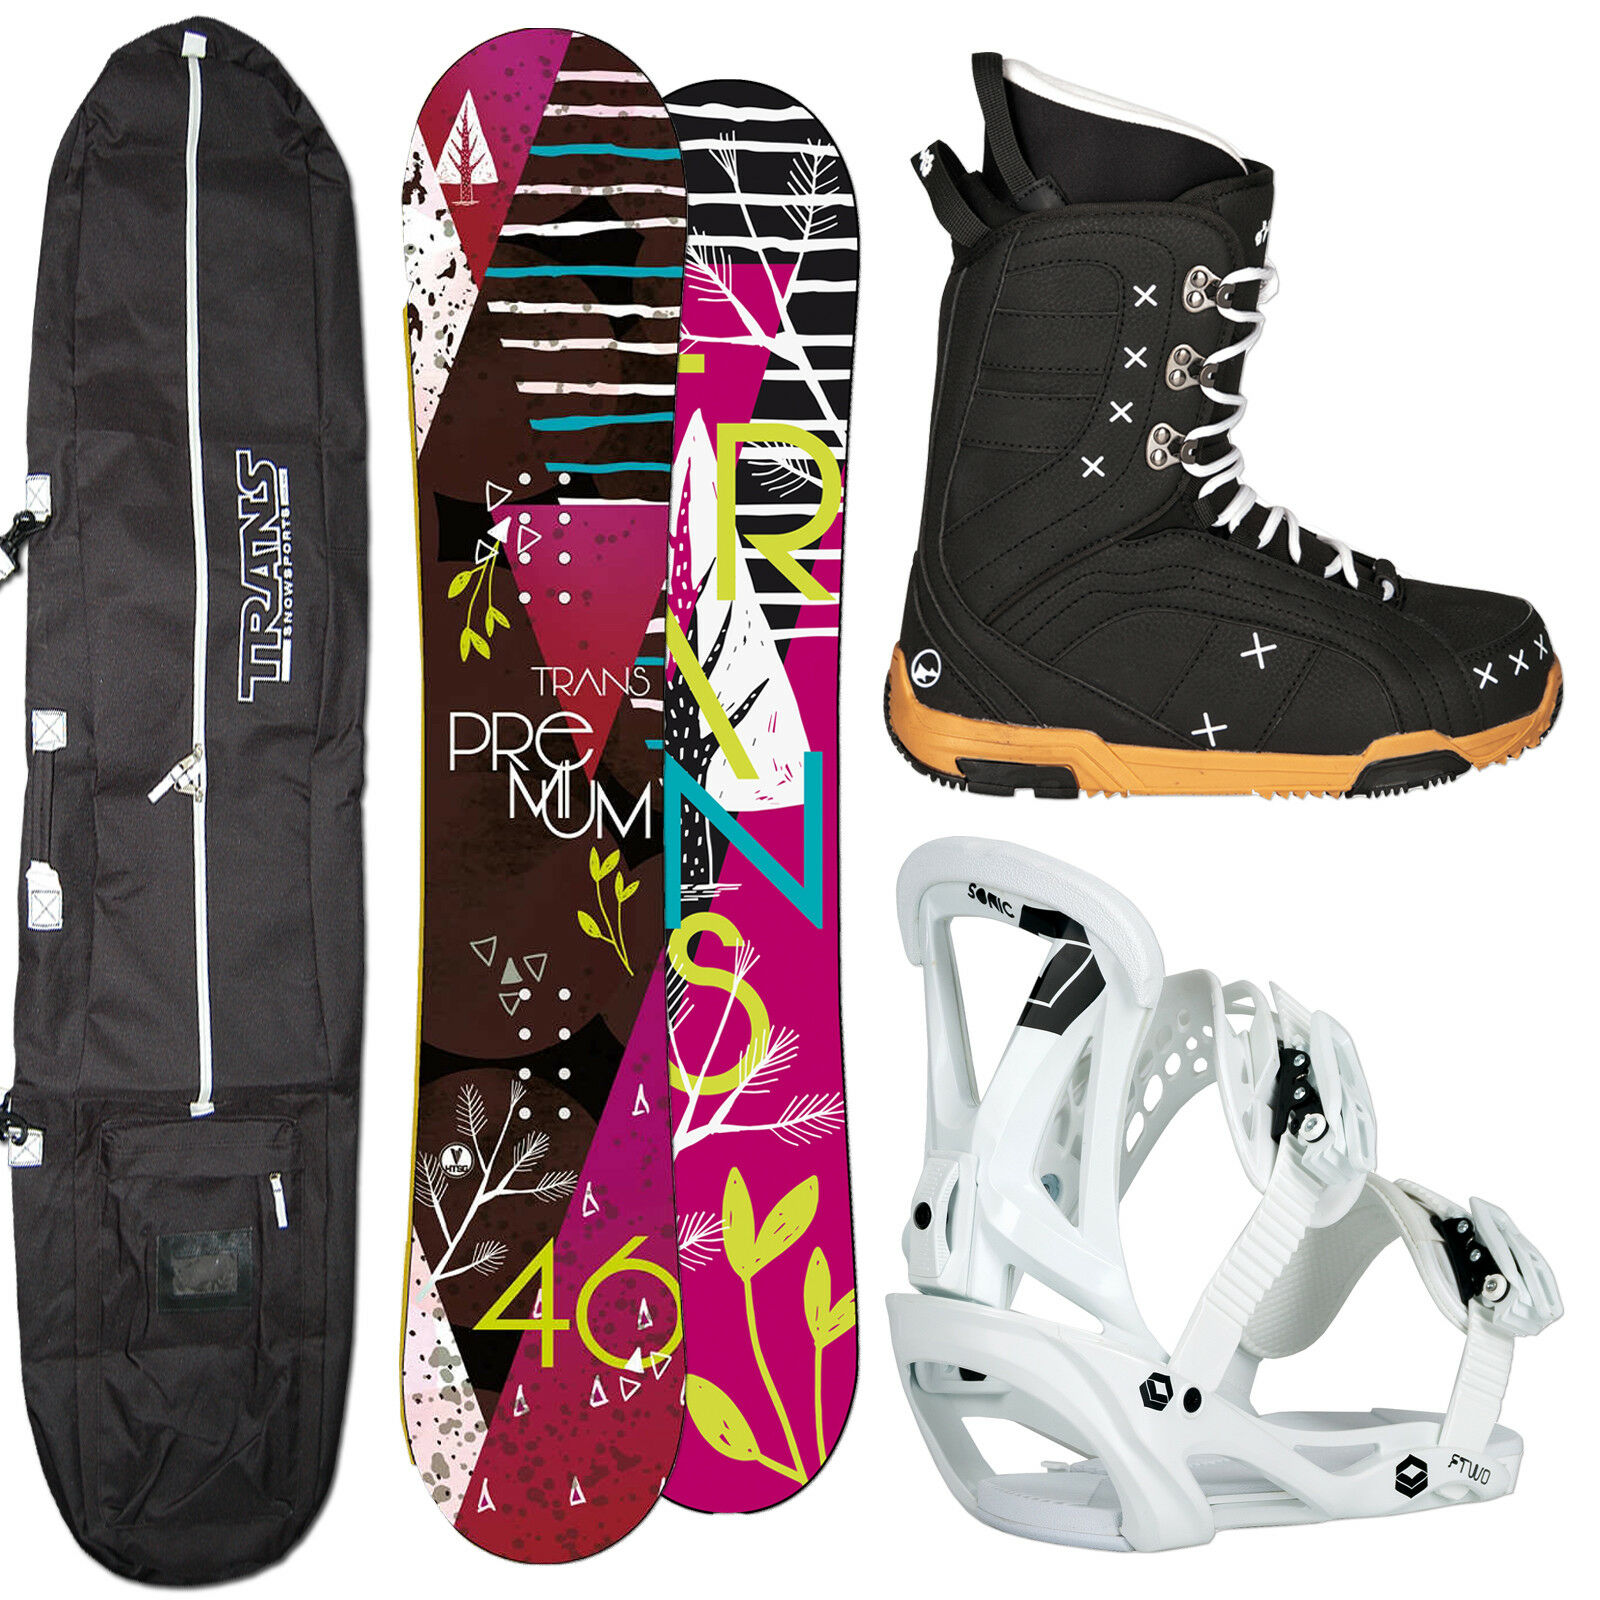 Femmes Snowboard Trans Trans Trans Premium 148 cm Baie + Sonic Fixation GR. M + Bottes +Sac 6cdfef